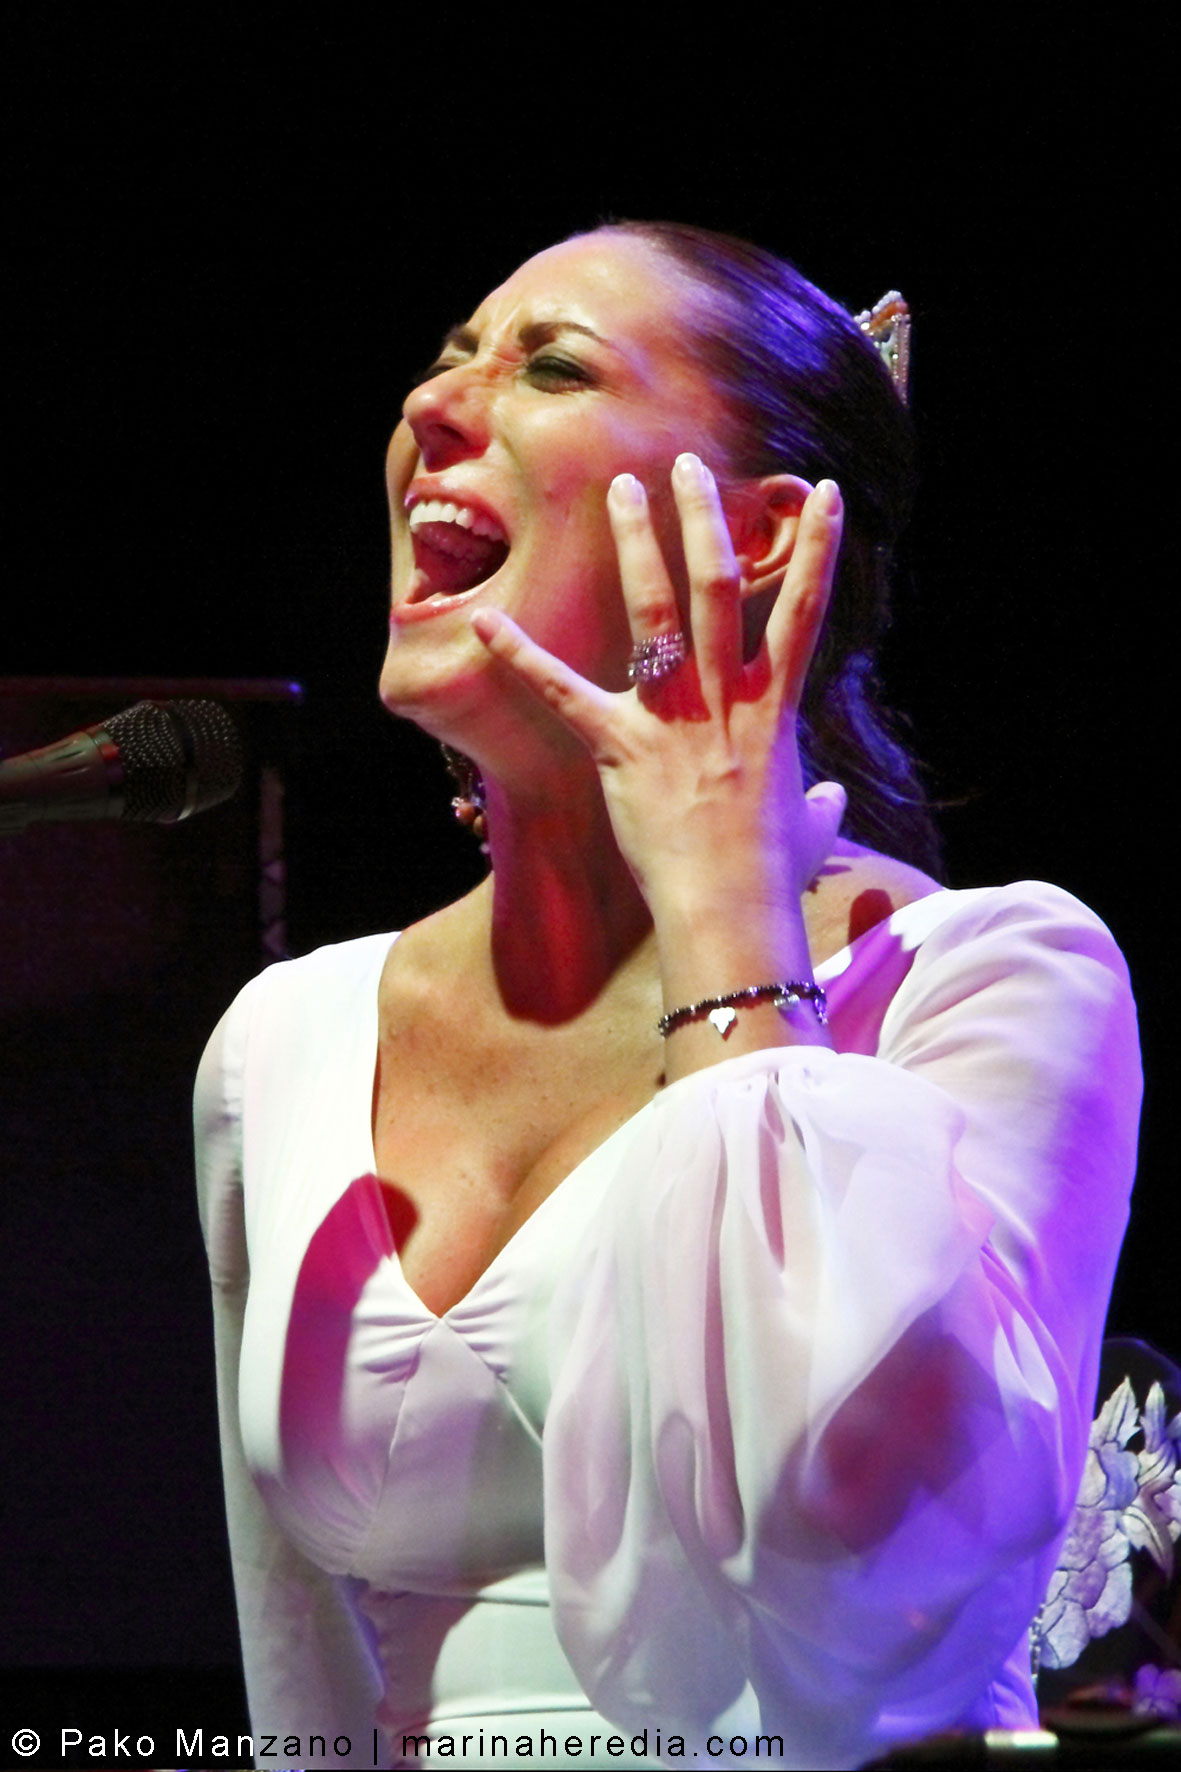 Marina Heredia - foto: Pako Manzano